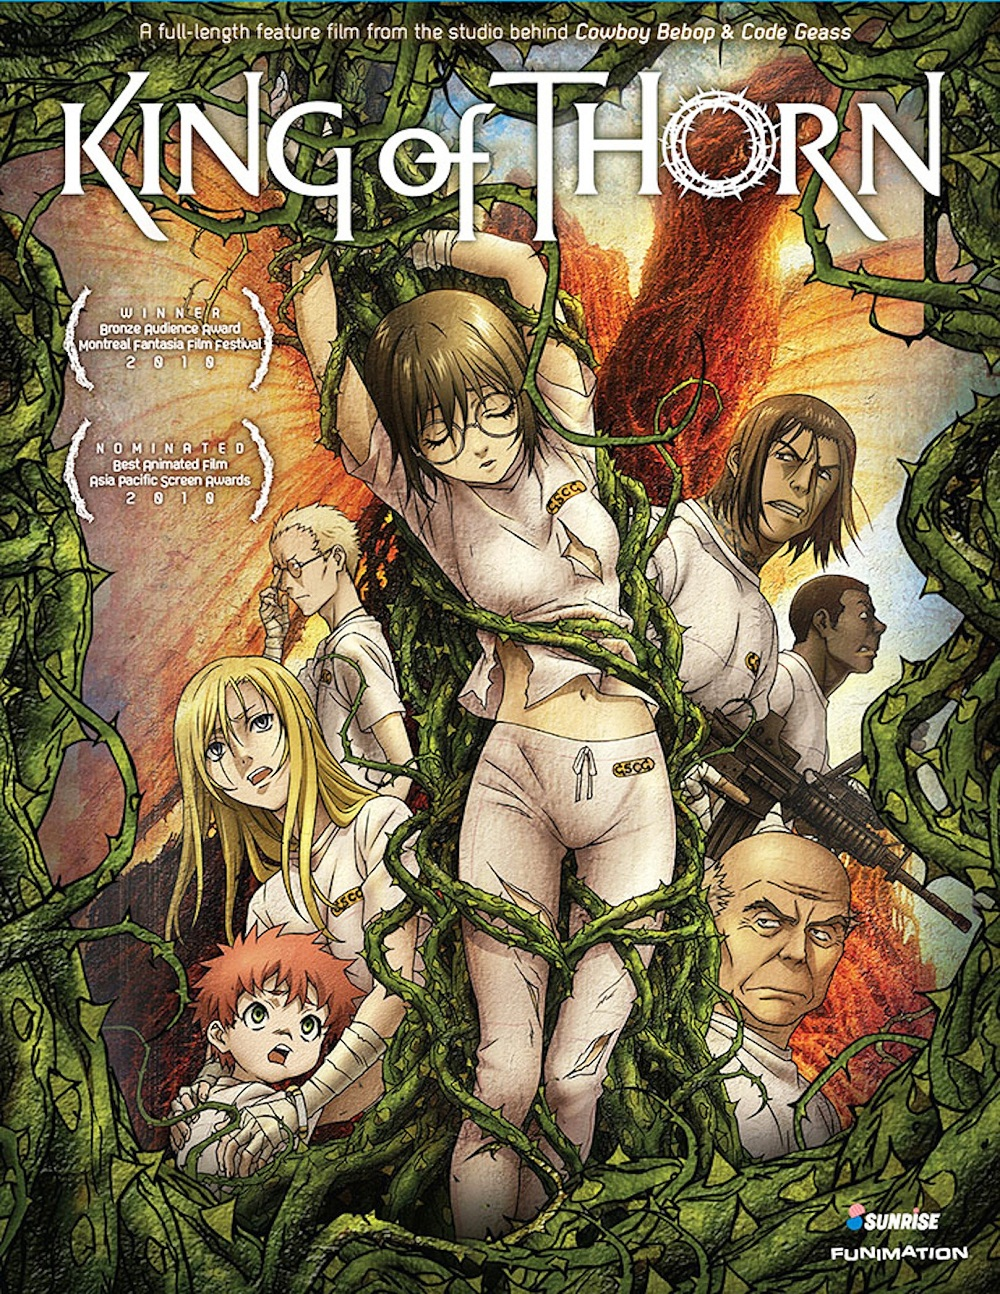 Ibara no Ou, King of Thorn